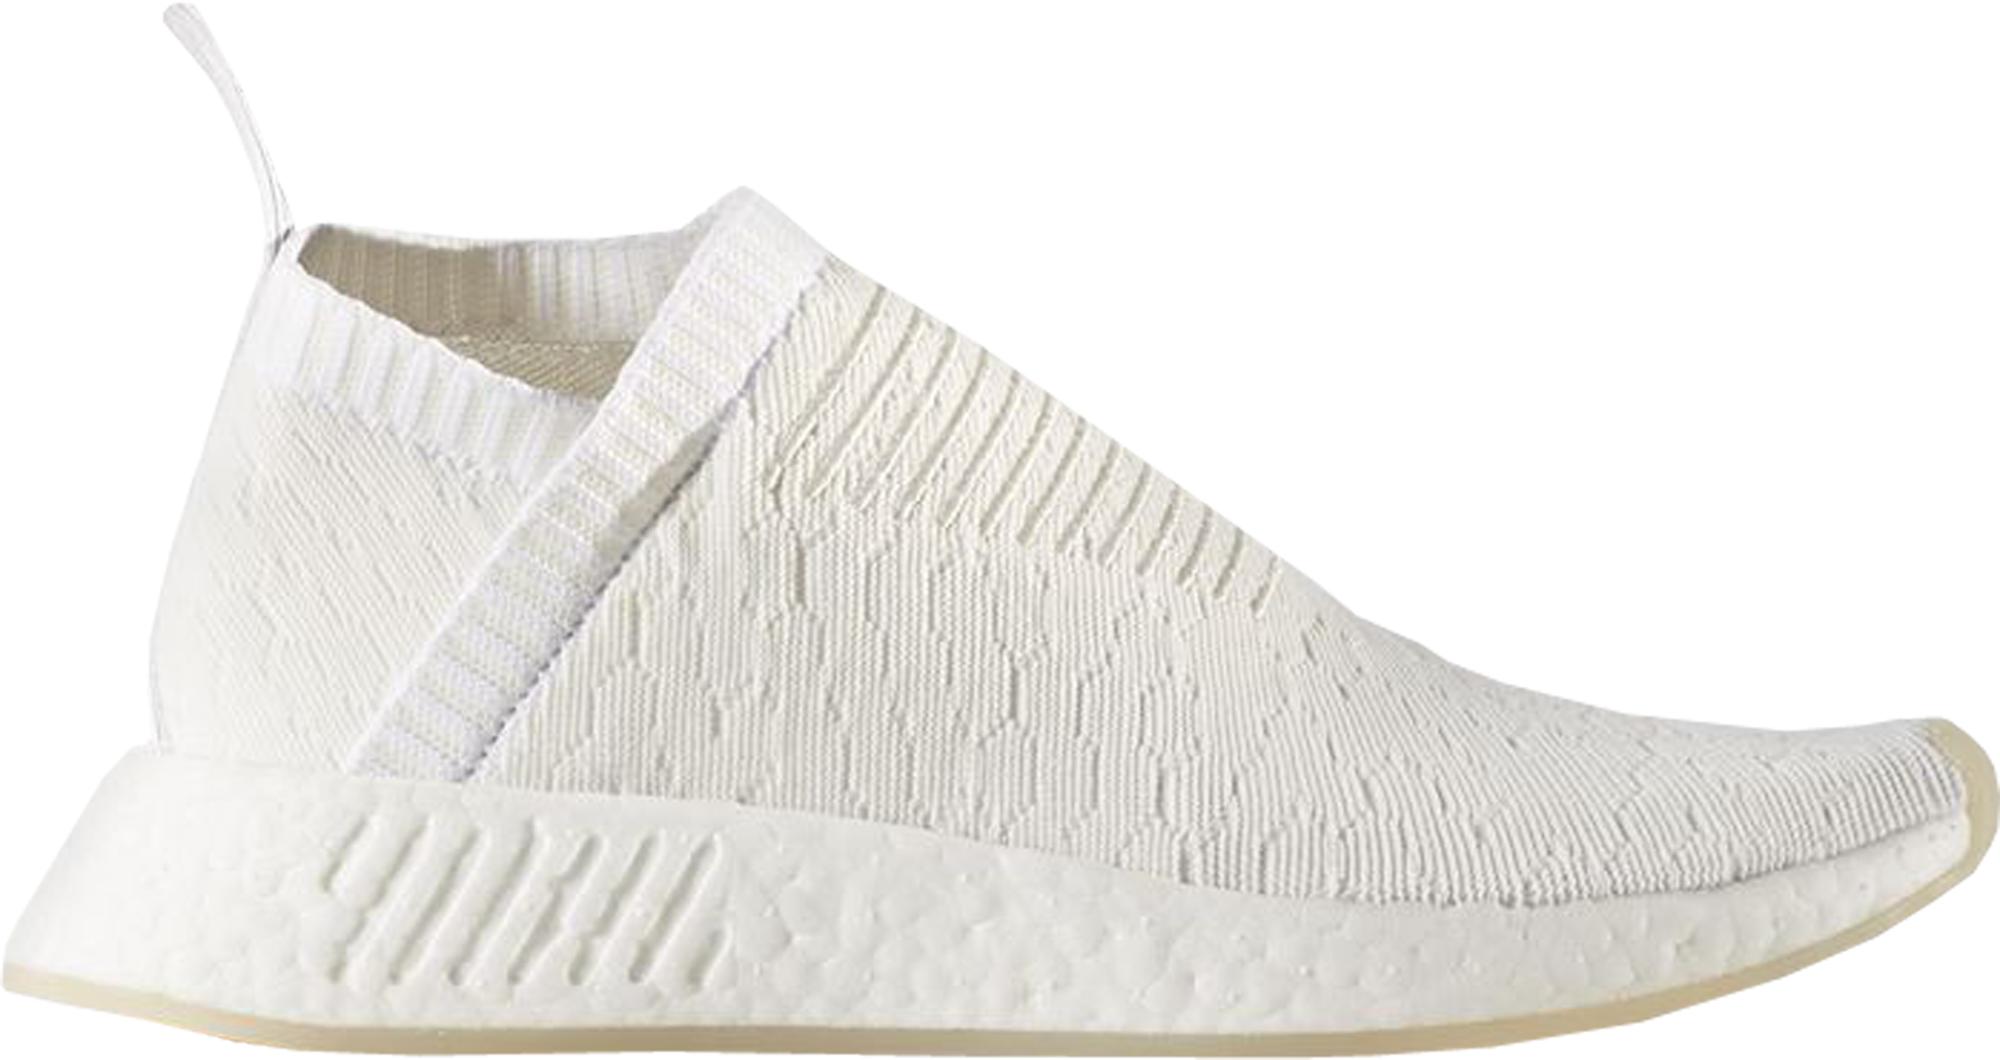 adidas NMD CS2 Triple White (W) - BY3018